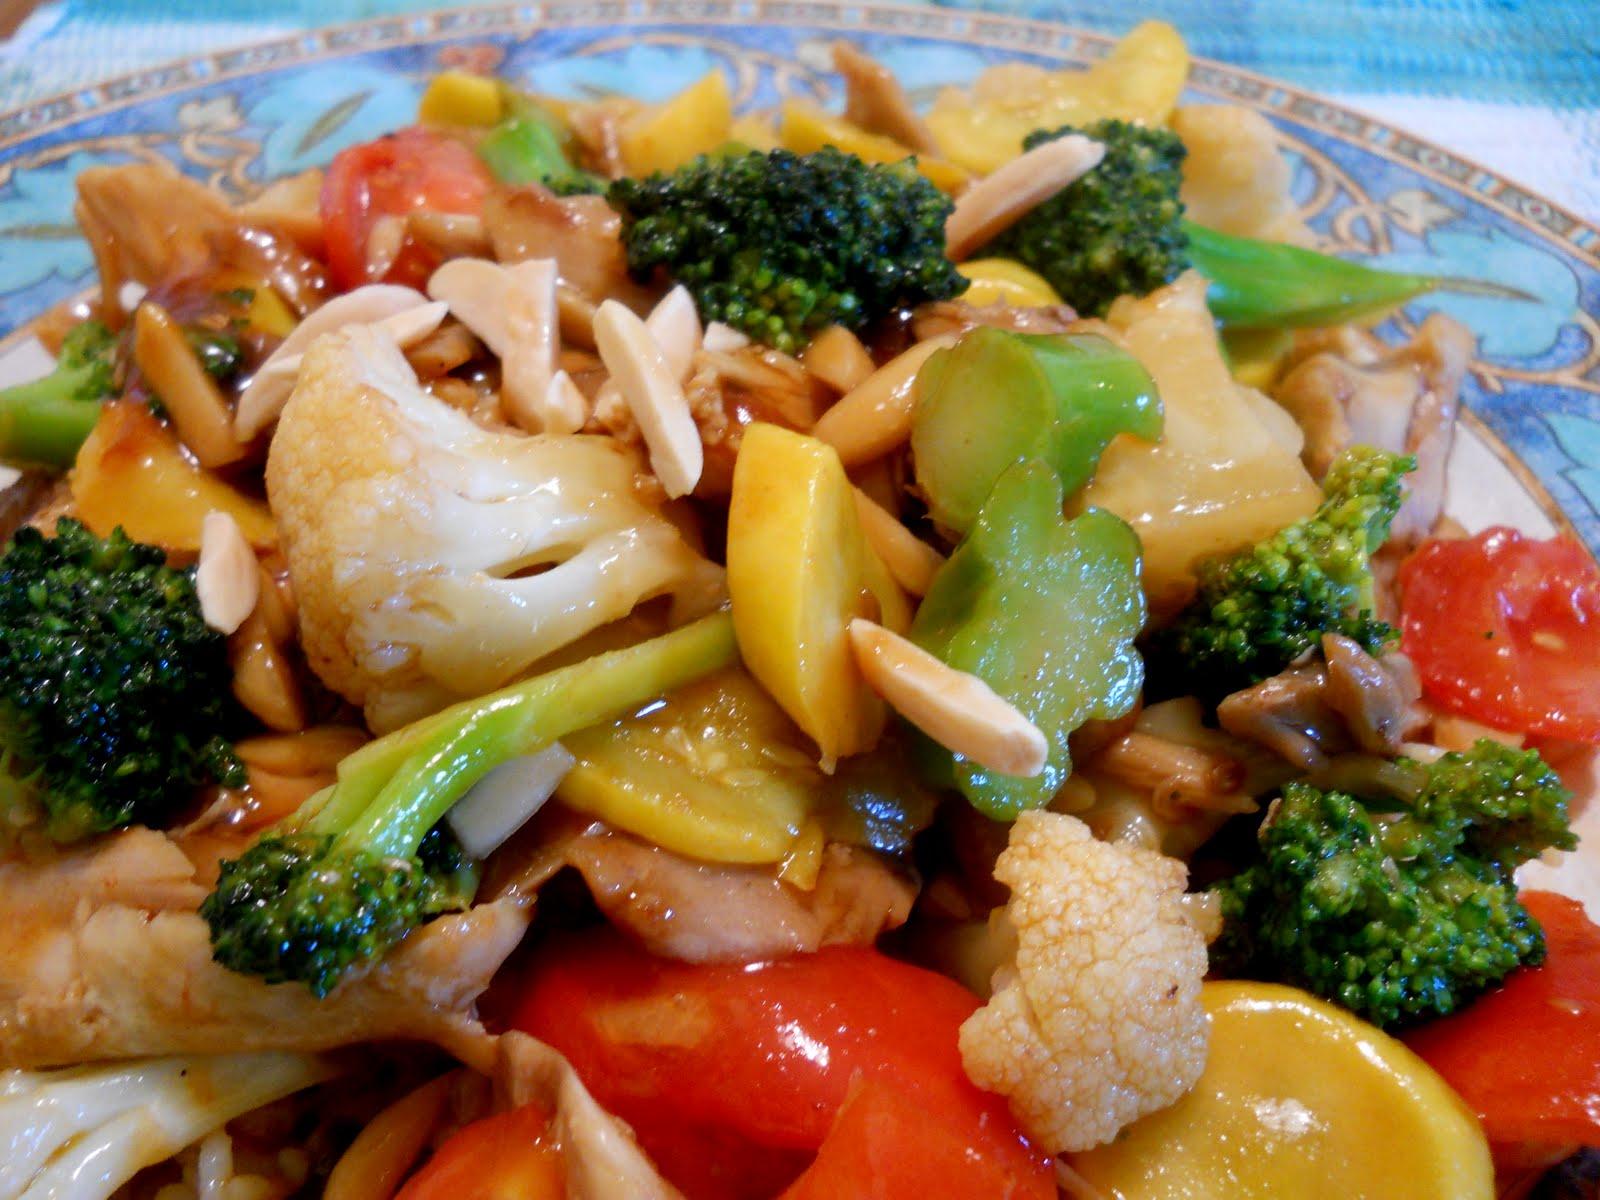 Low Fat Meals 8